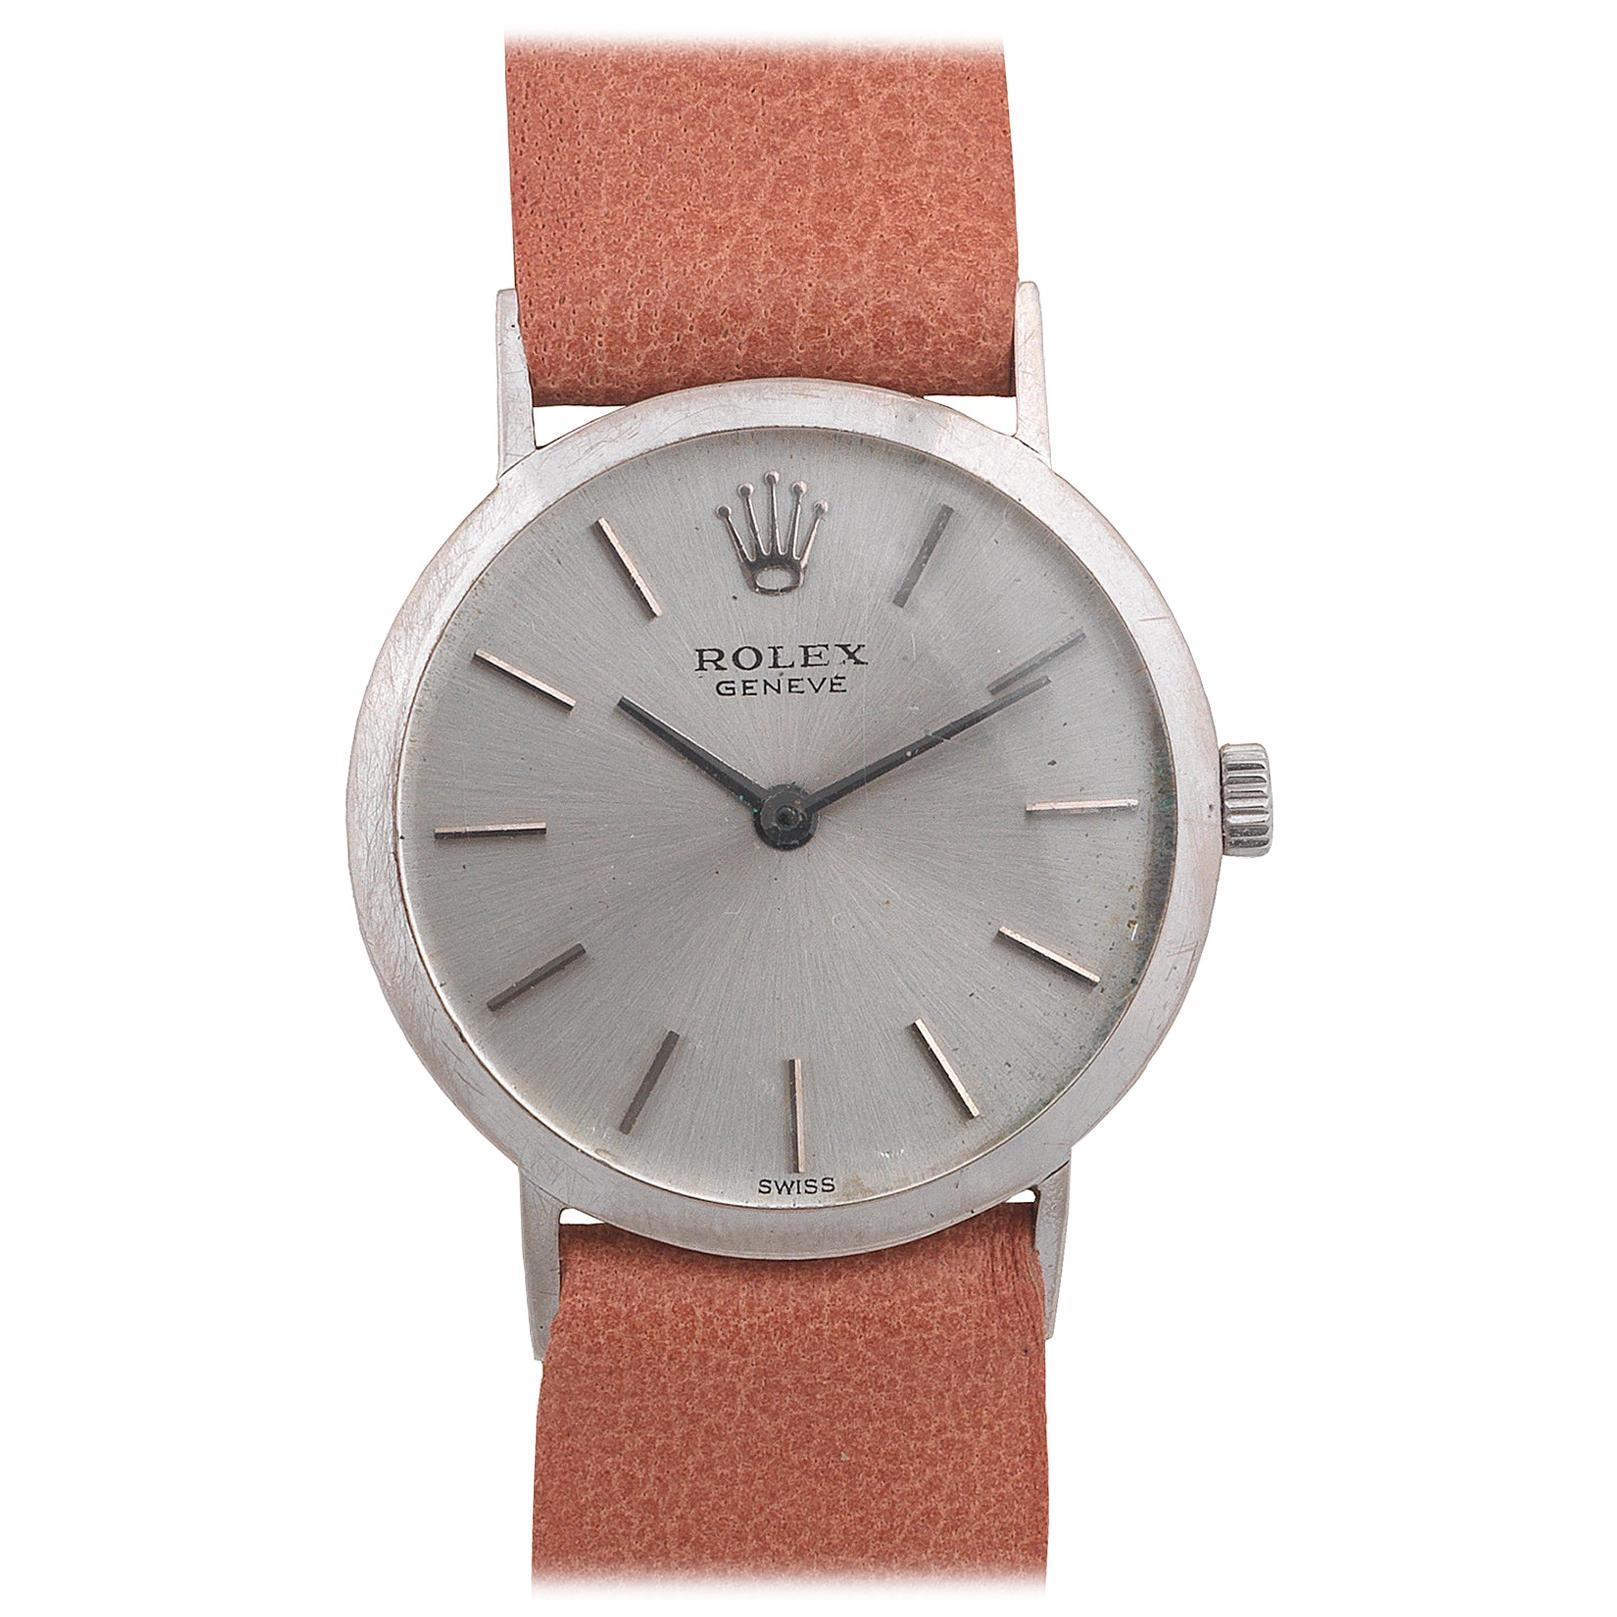 Rolex Cellini Ladies 18 Karat White Gold Manual Wind Wristwatch